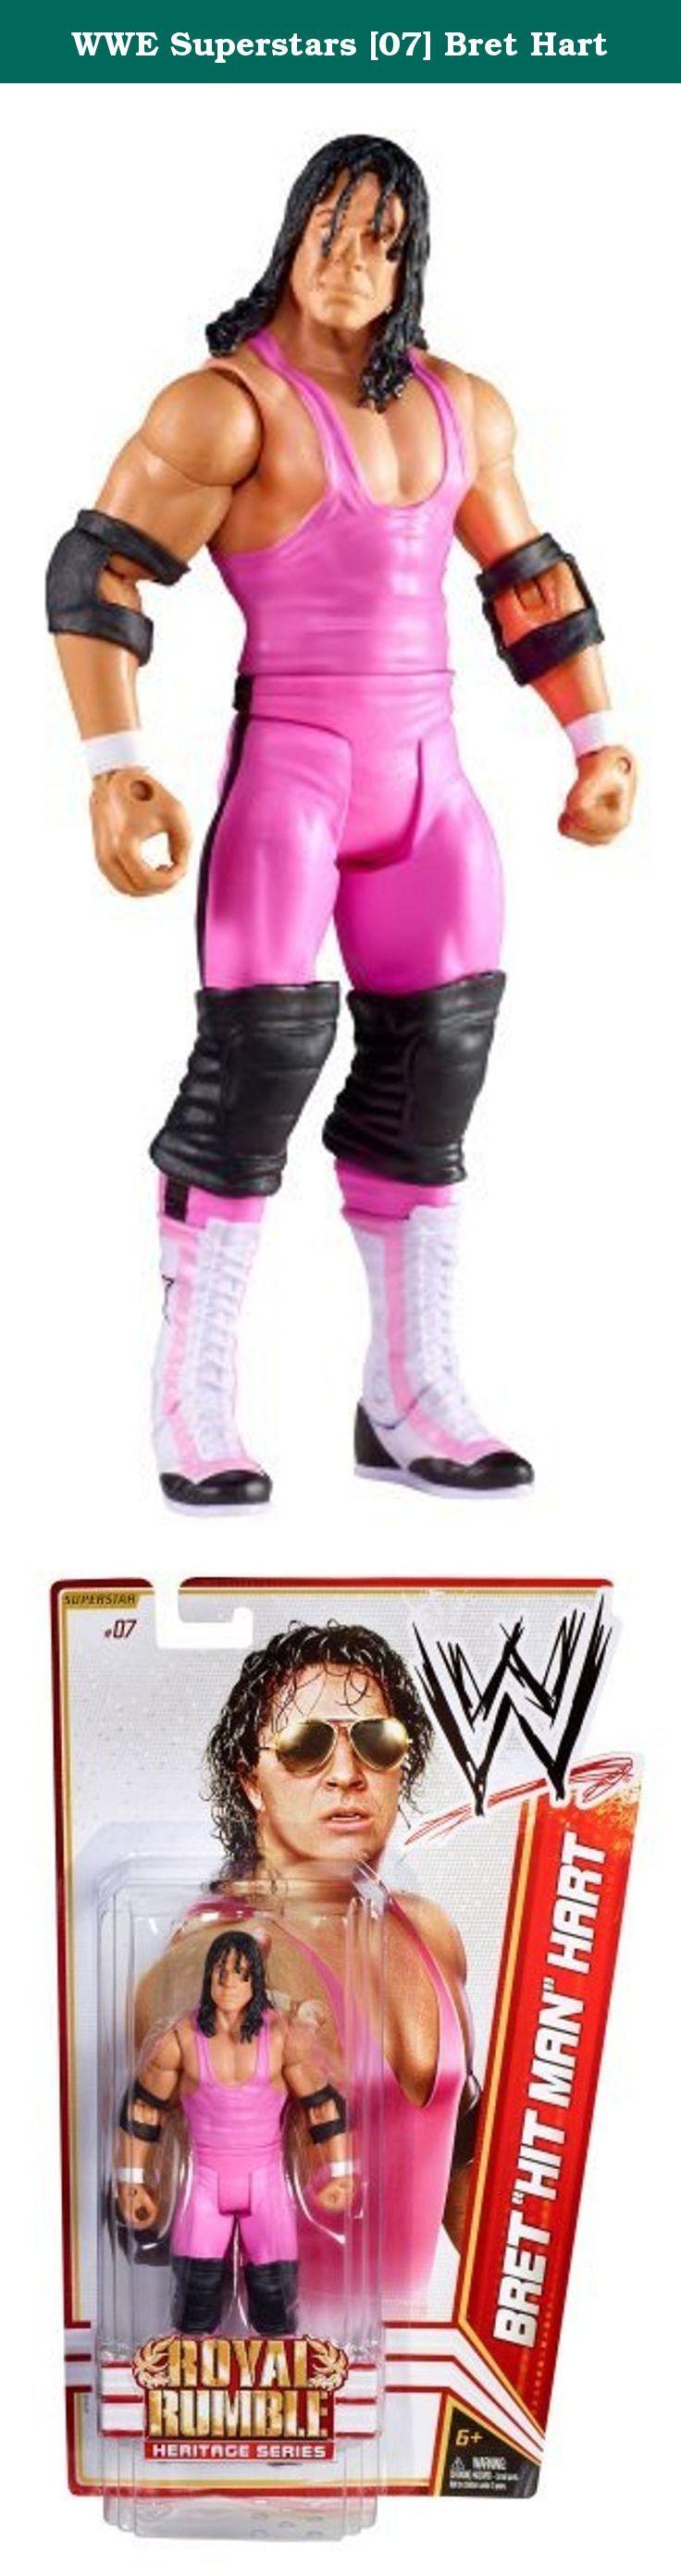 WWE Superstars [07] Bret Hart. It's shipped off from Japan.